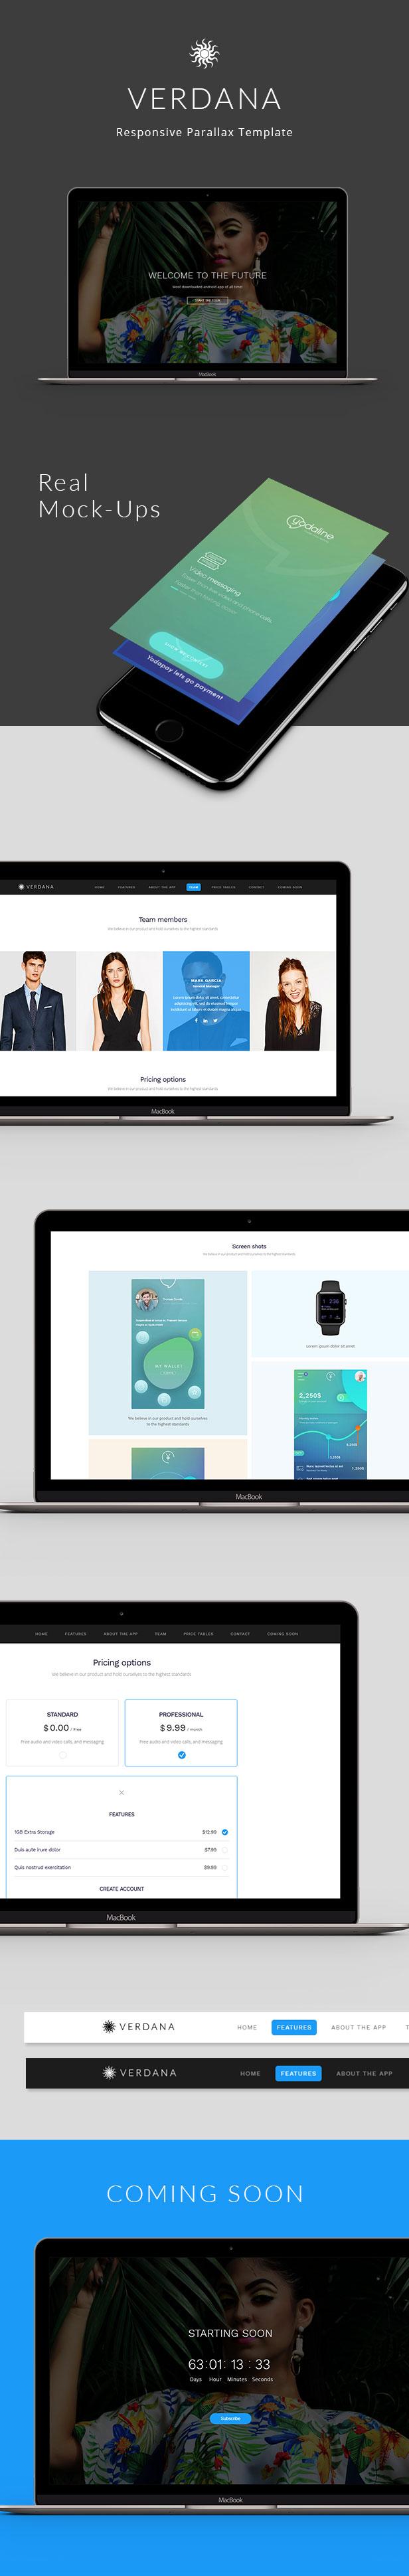 Verdana - Responsive App Landing Template - 1